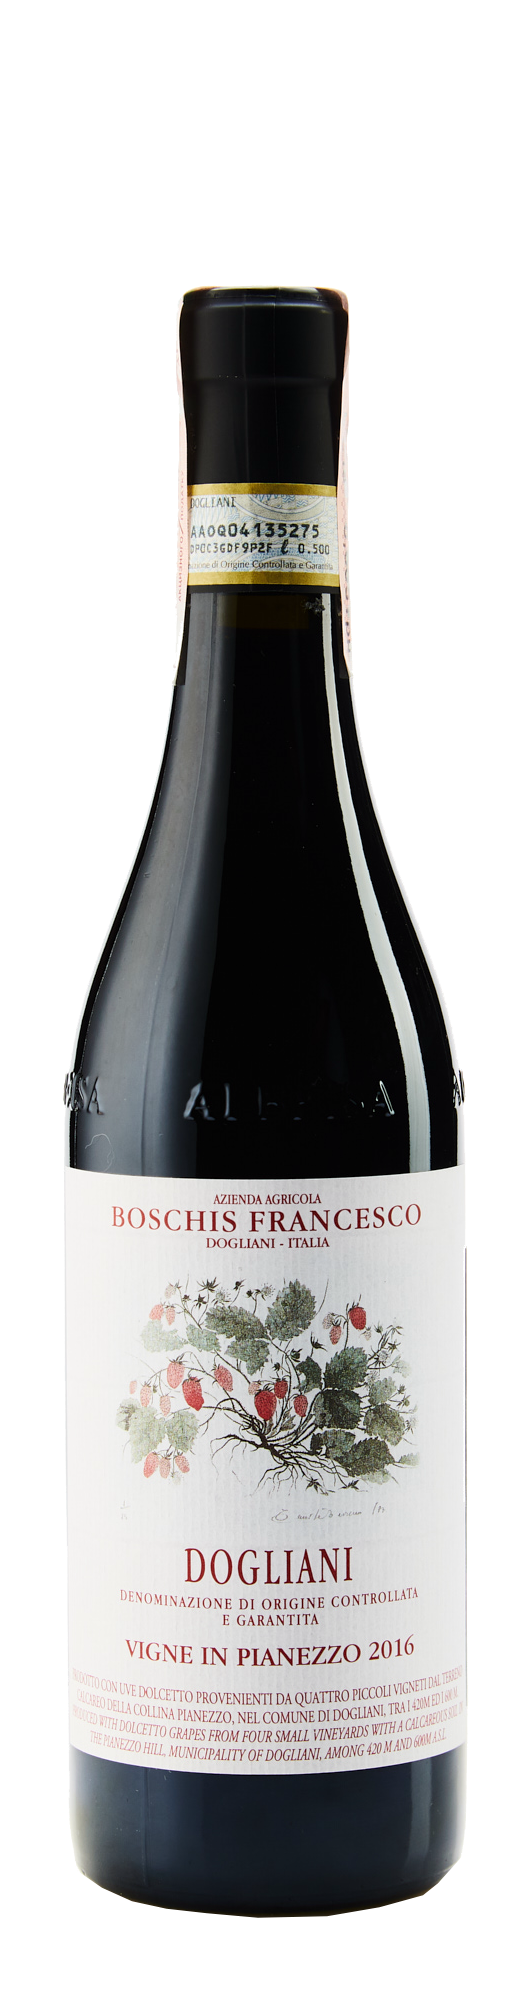 Francesco Boschis Dogliani Vigne in Pianezzo wine wine магазин склад